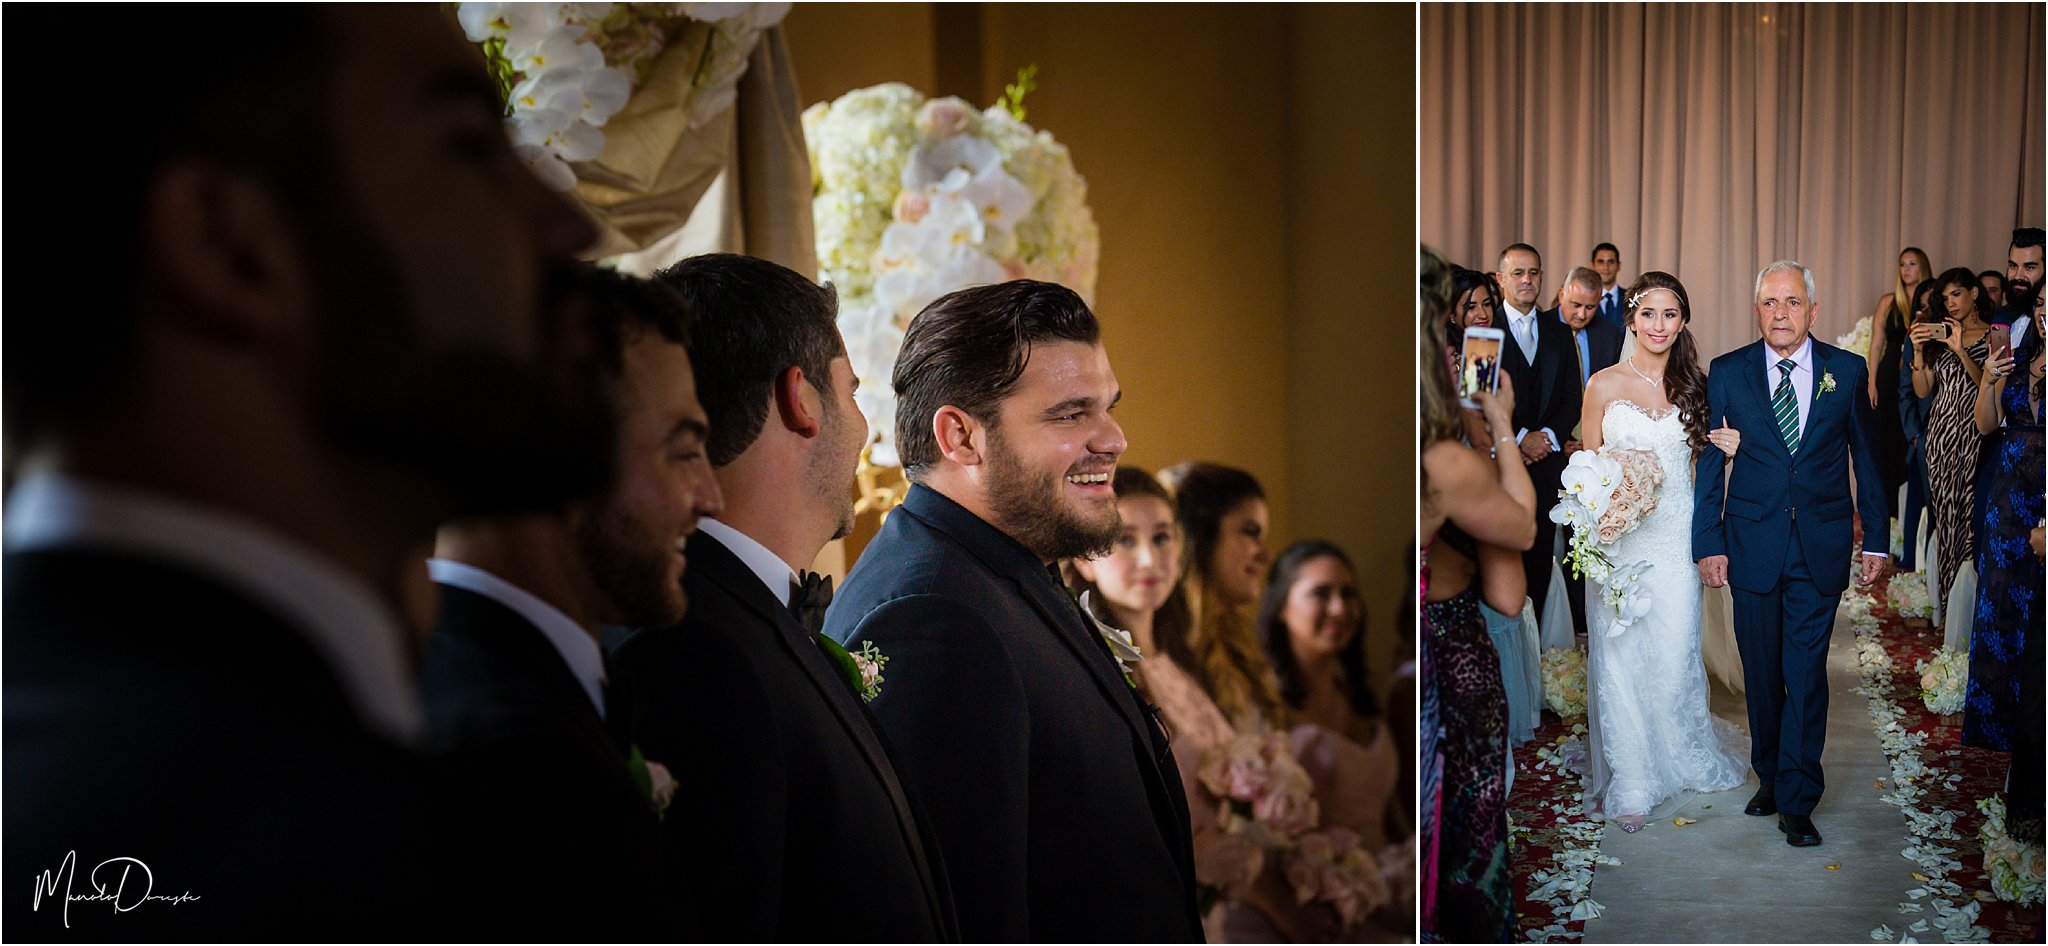 0163_ManoloDoreste_InFocusStudios_Wedding_Family_Photography_Miami_MiamiPhotographer.jpg